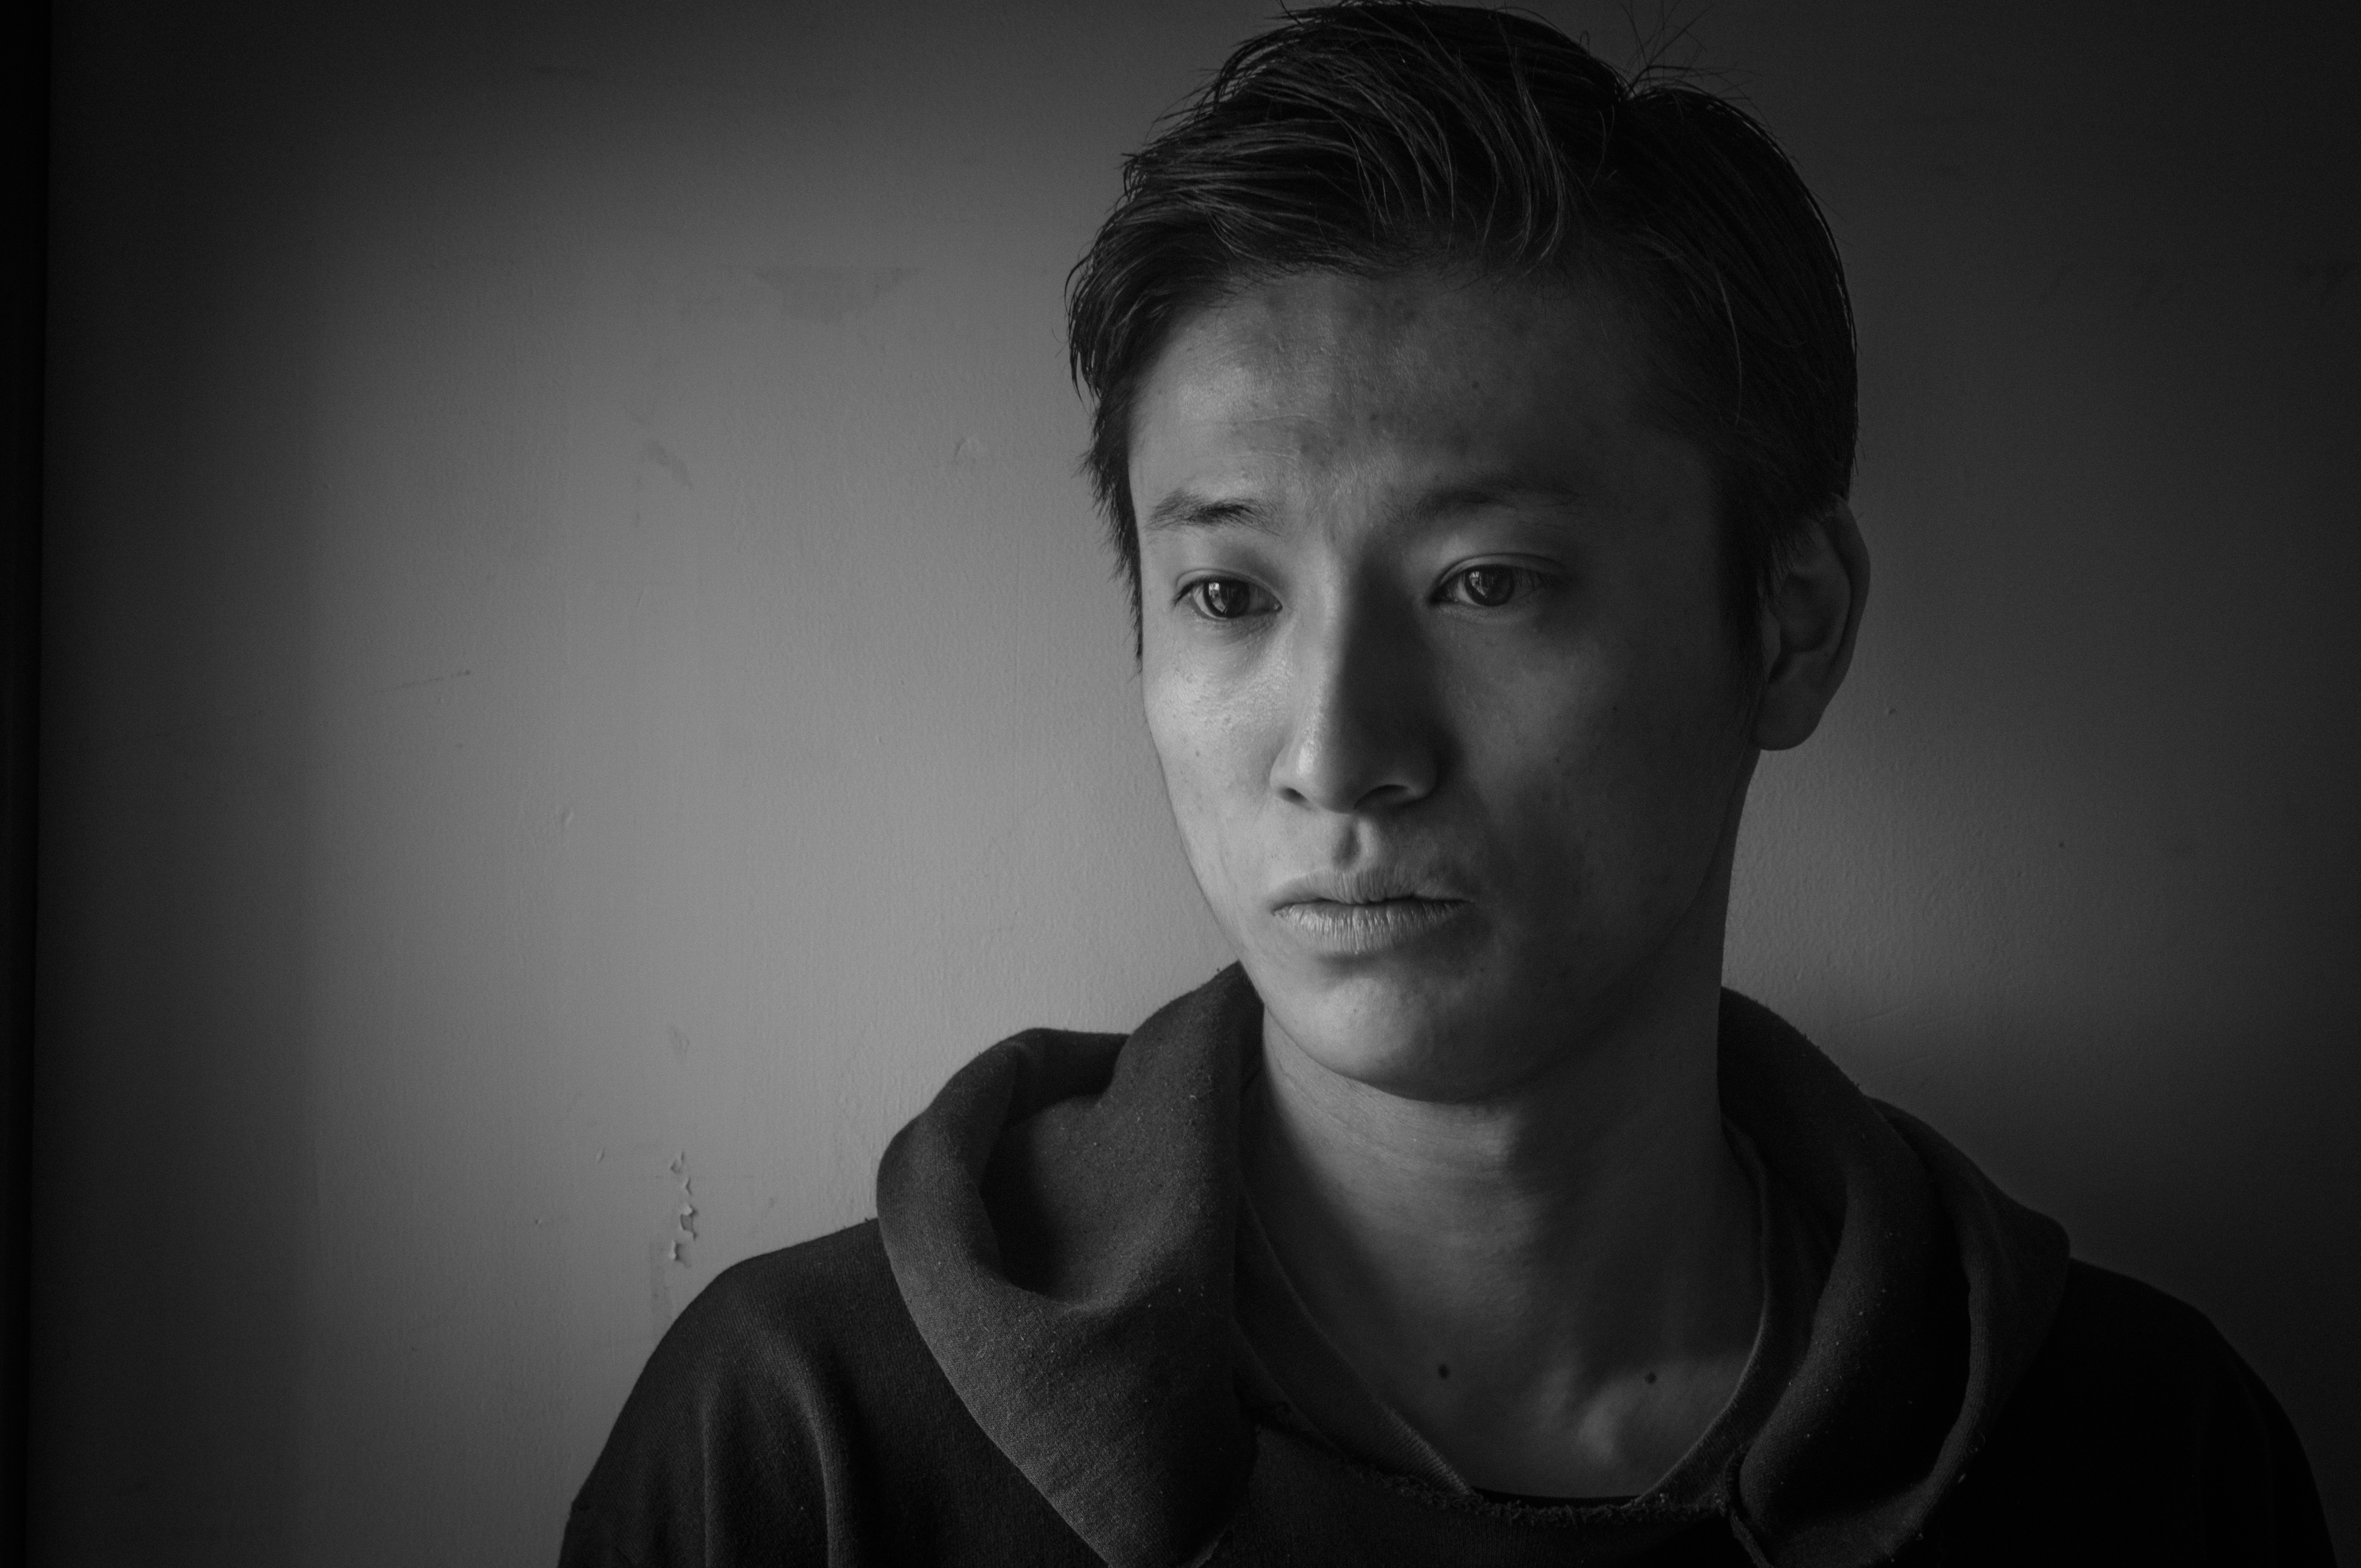 Kiyoaki Nishiyama  actor  西山聖了さん 俳優